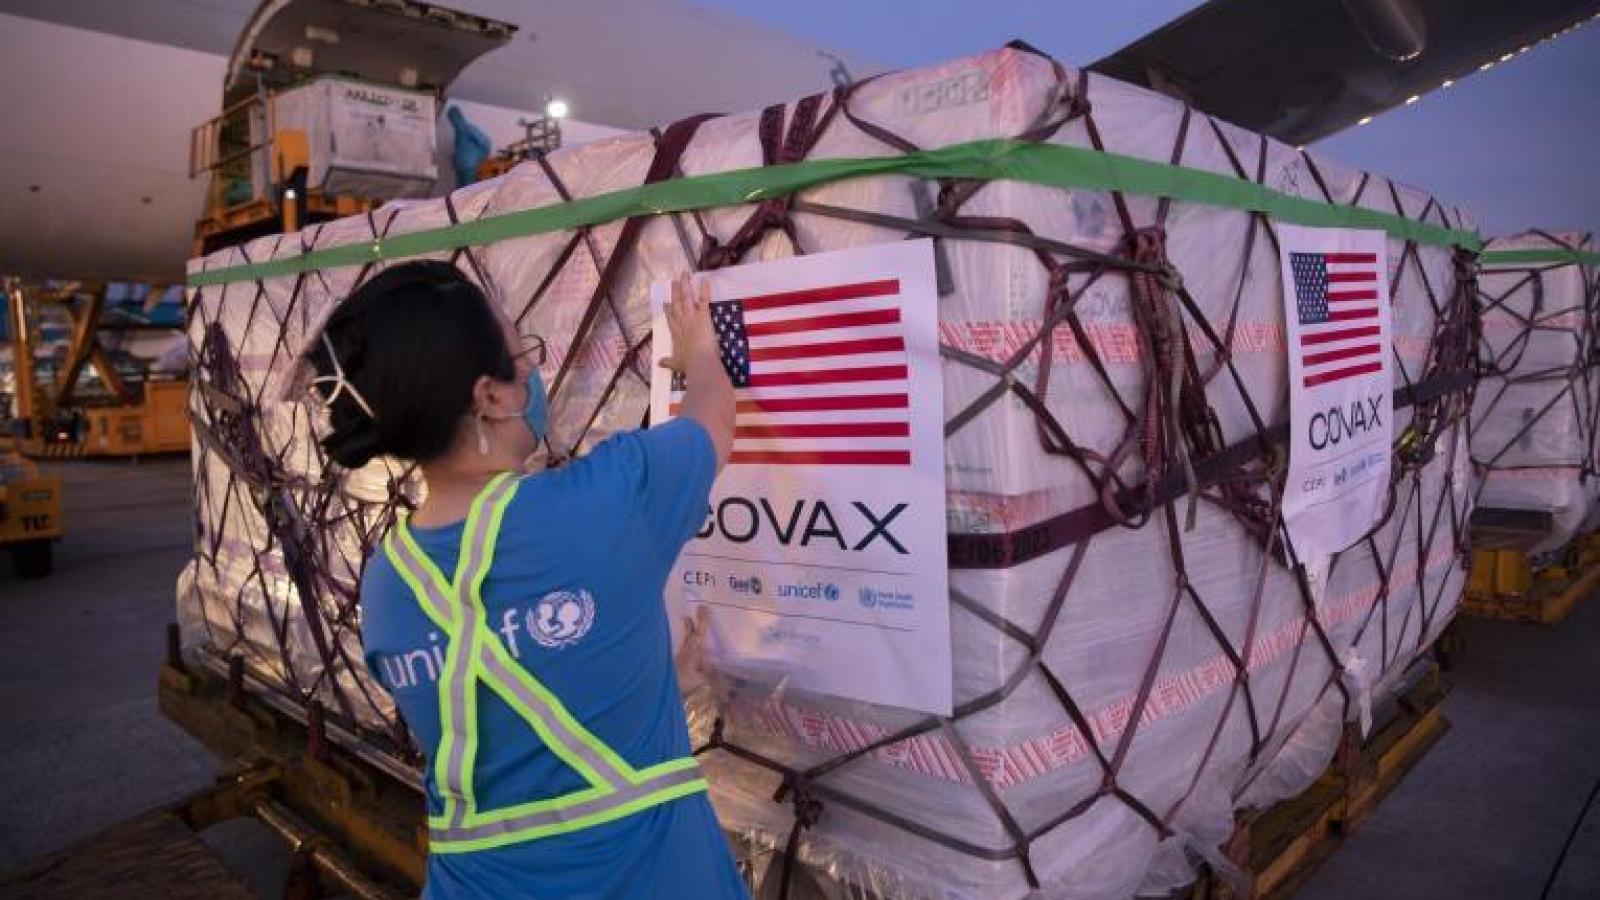 Second US shipment of 3 million doses of Moderna vaccine arrives in Vietnam